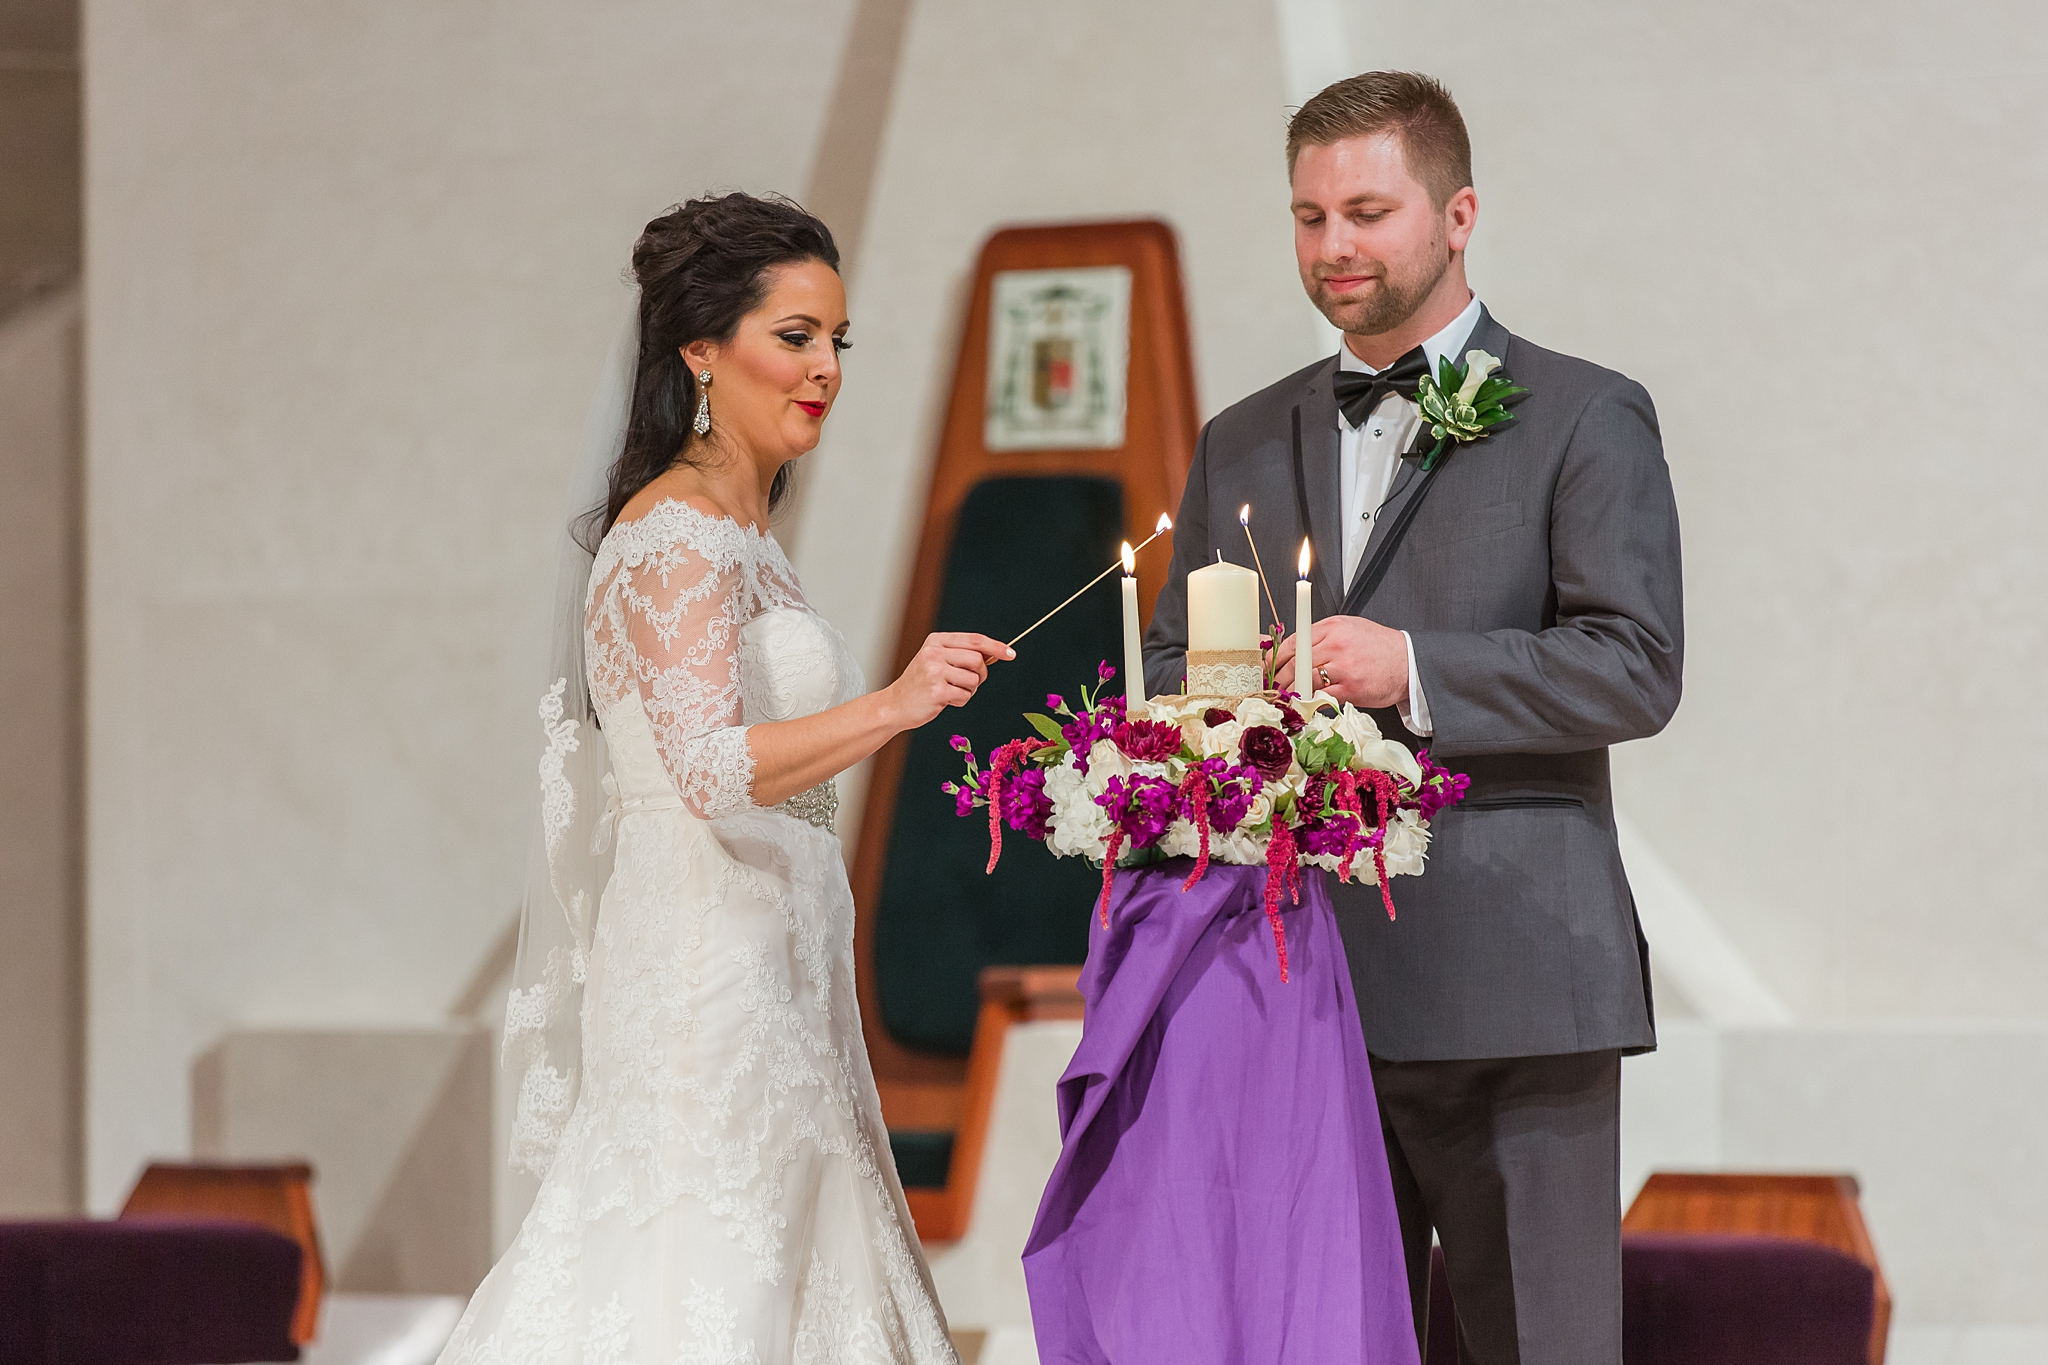 detroit-colony-club-wedding-regal-romantic-photography-in-detroit-mi-by-courtney-carolyn-photography_0030.jpg